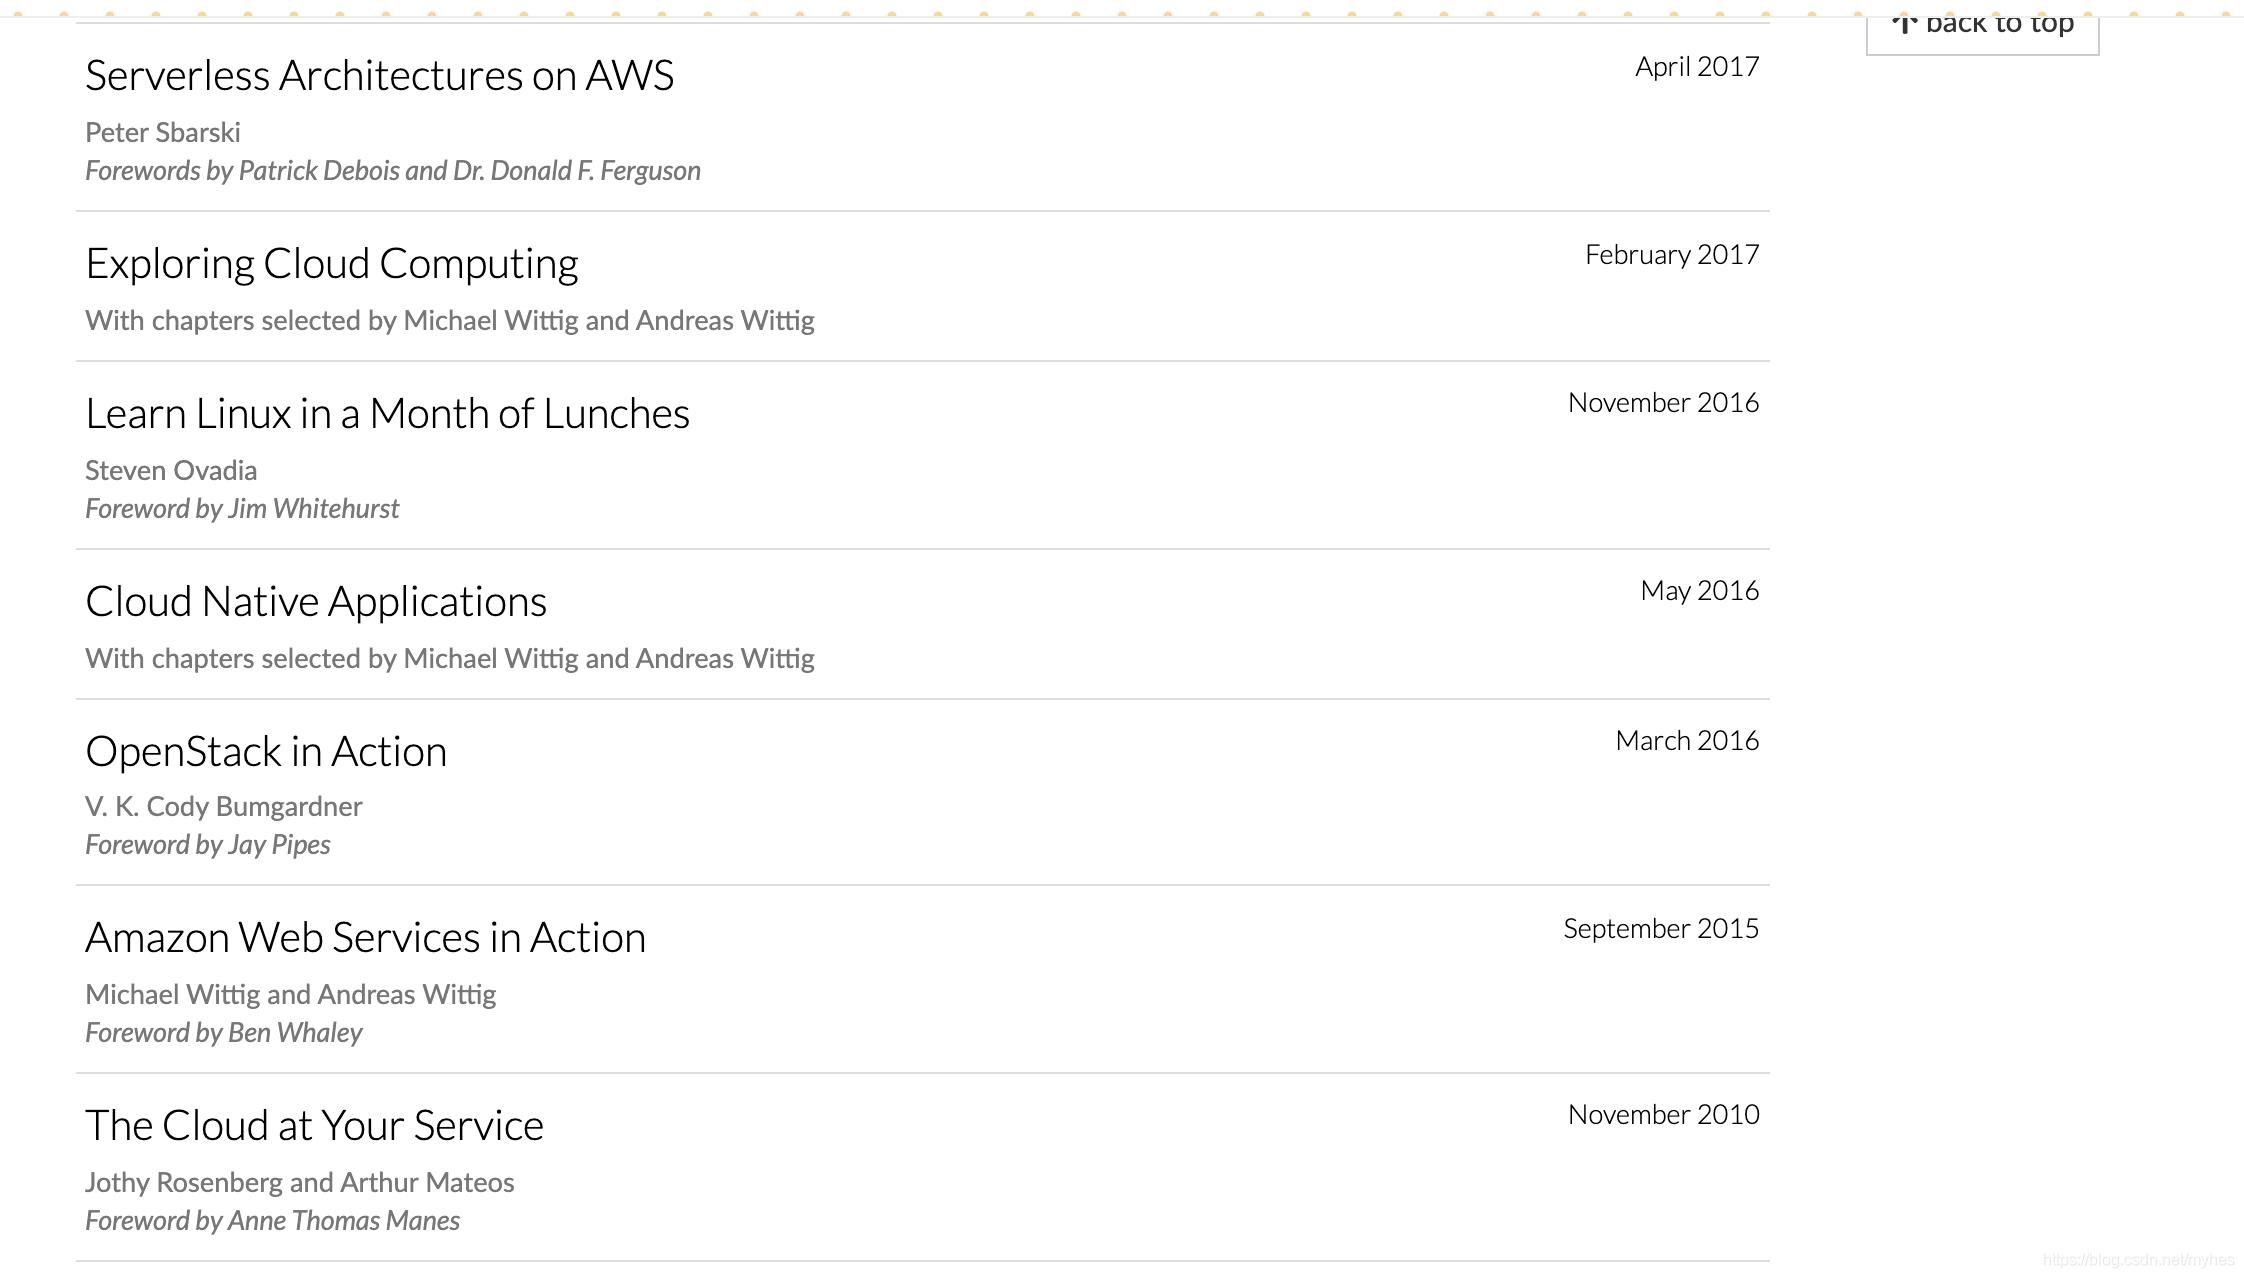 manning书籍类目和正版书籍清单